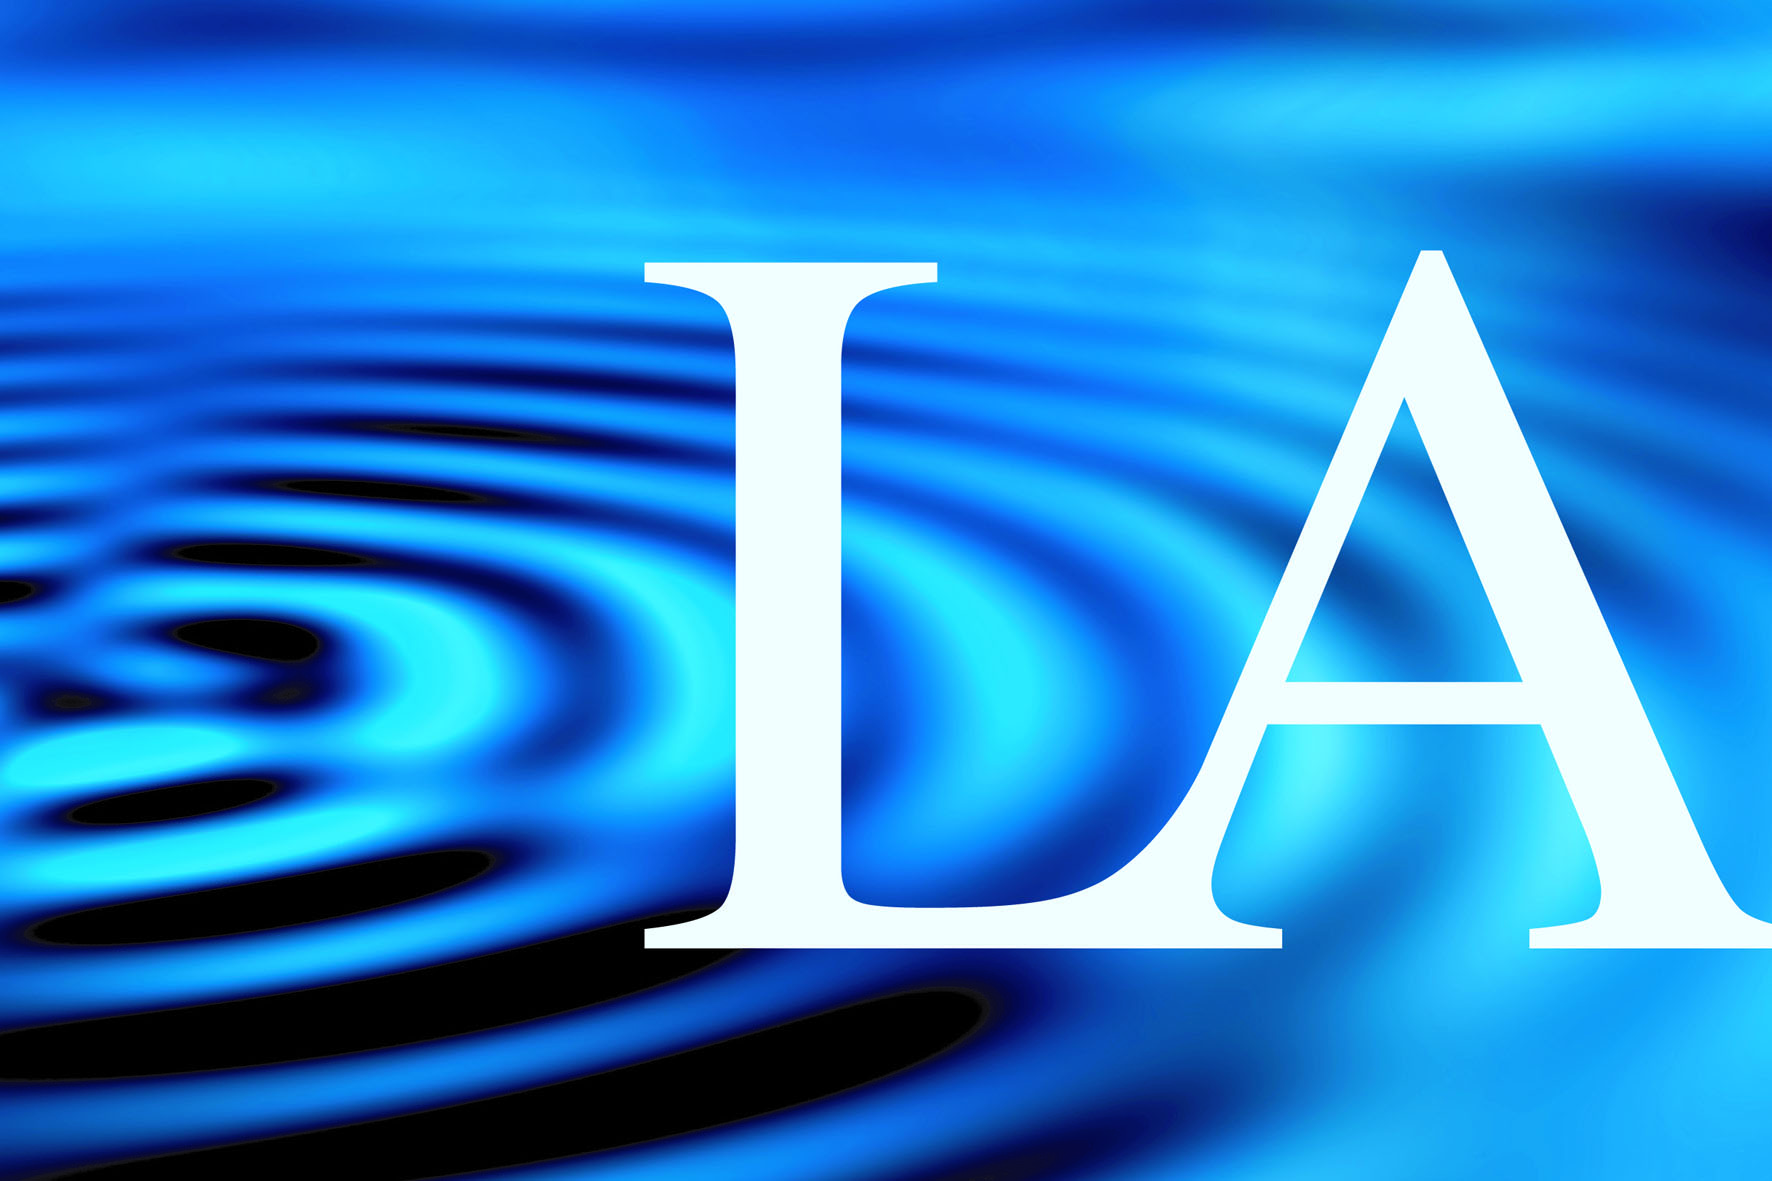 La-Logogenesi